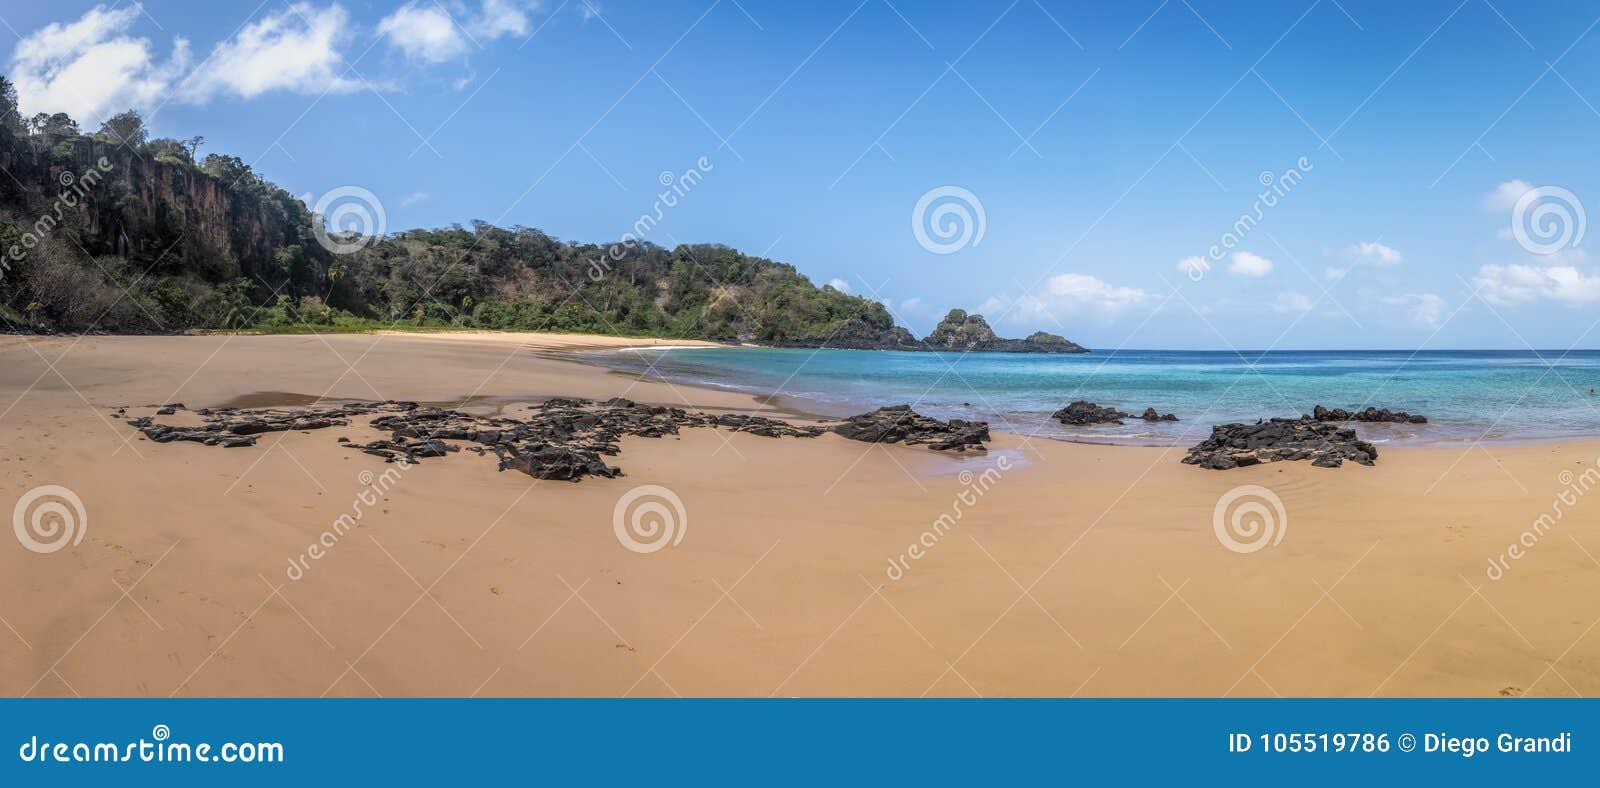 Panoramiczny widok Praia robi Sancho plaży - Fernando De Noronha, Pernambuco, Brazylia